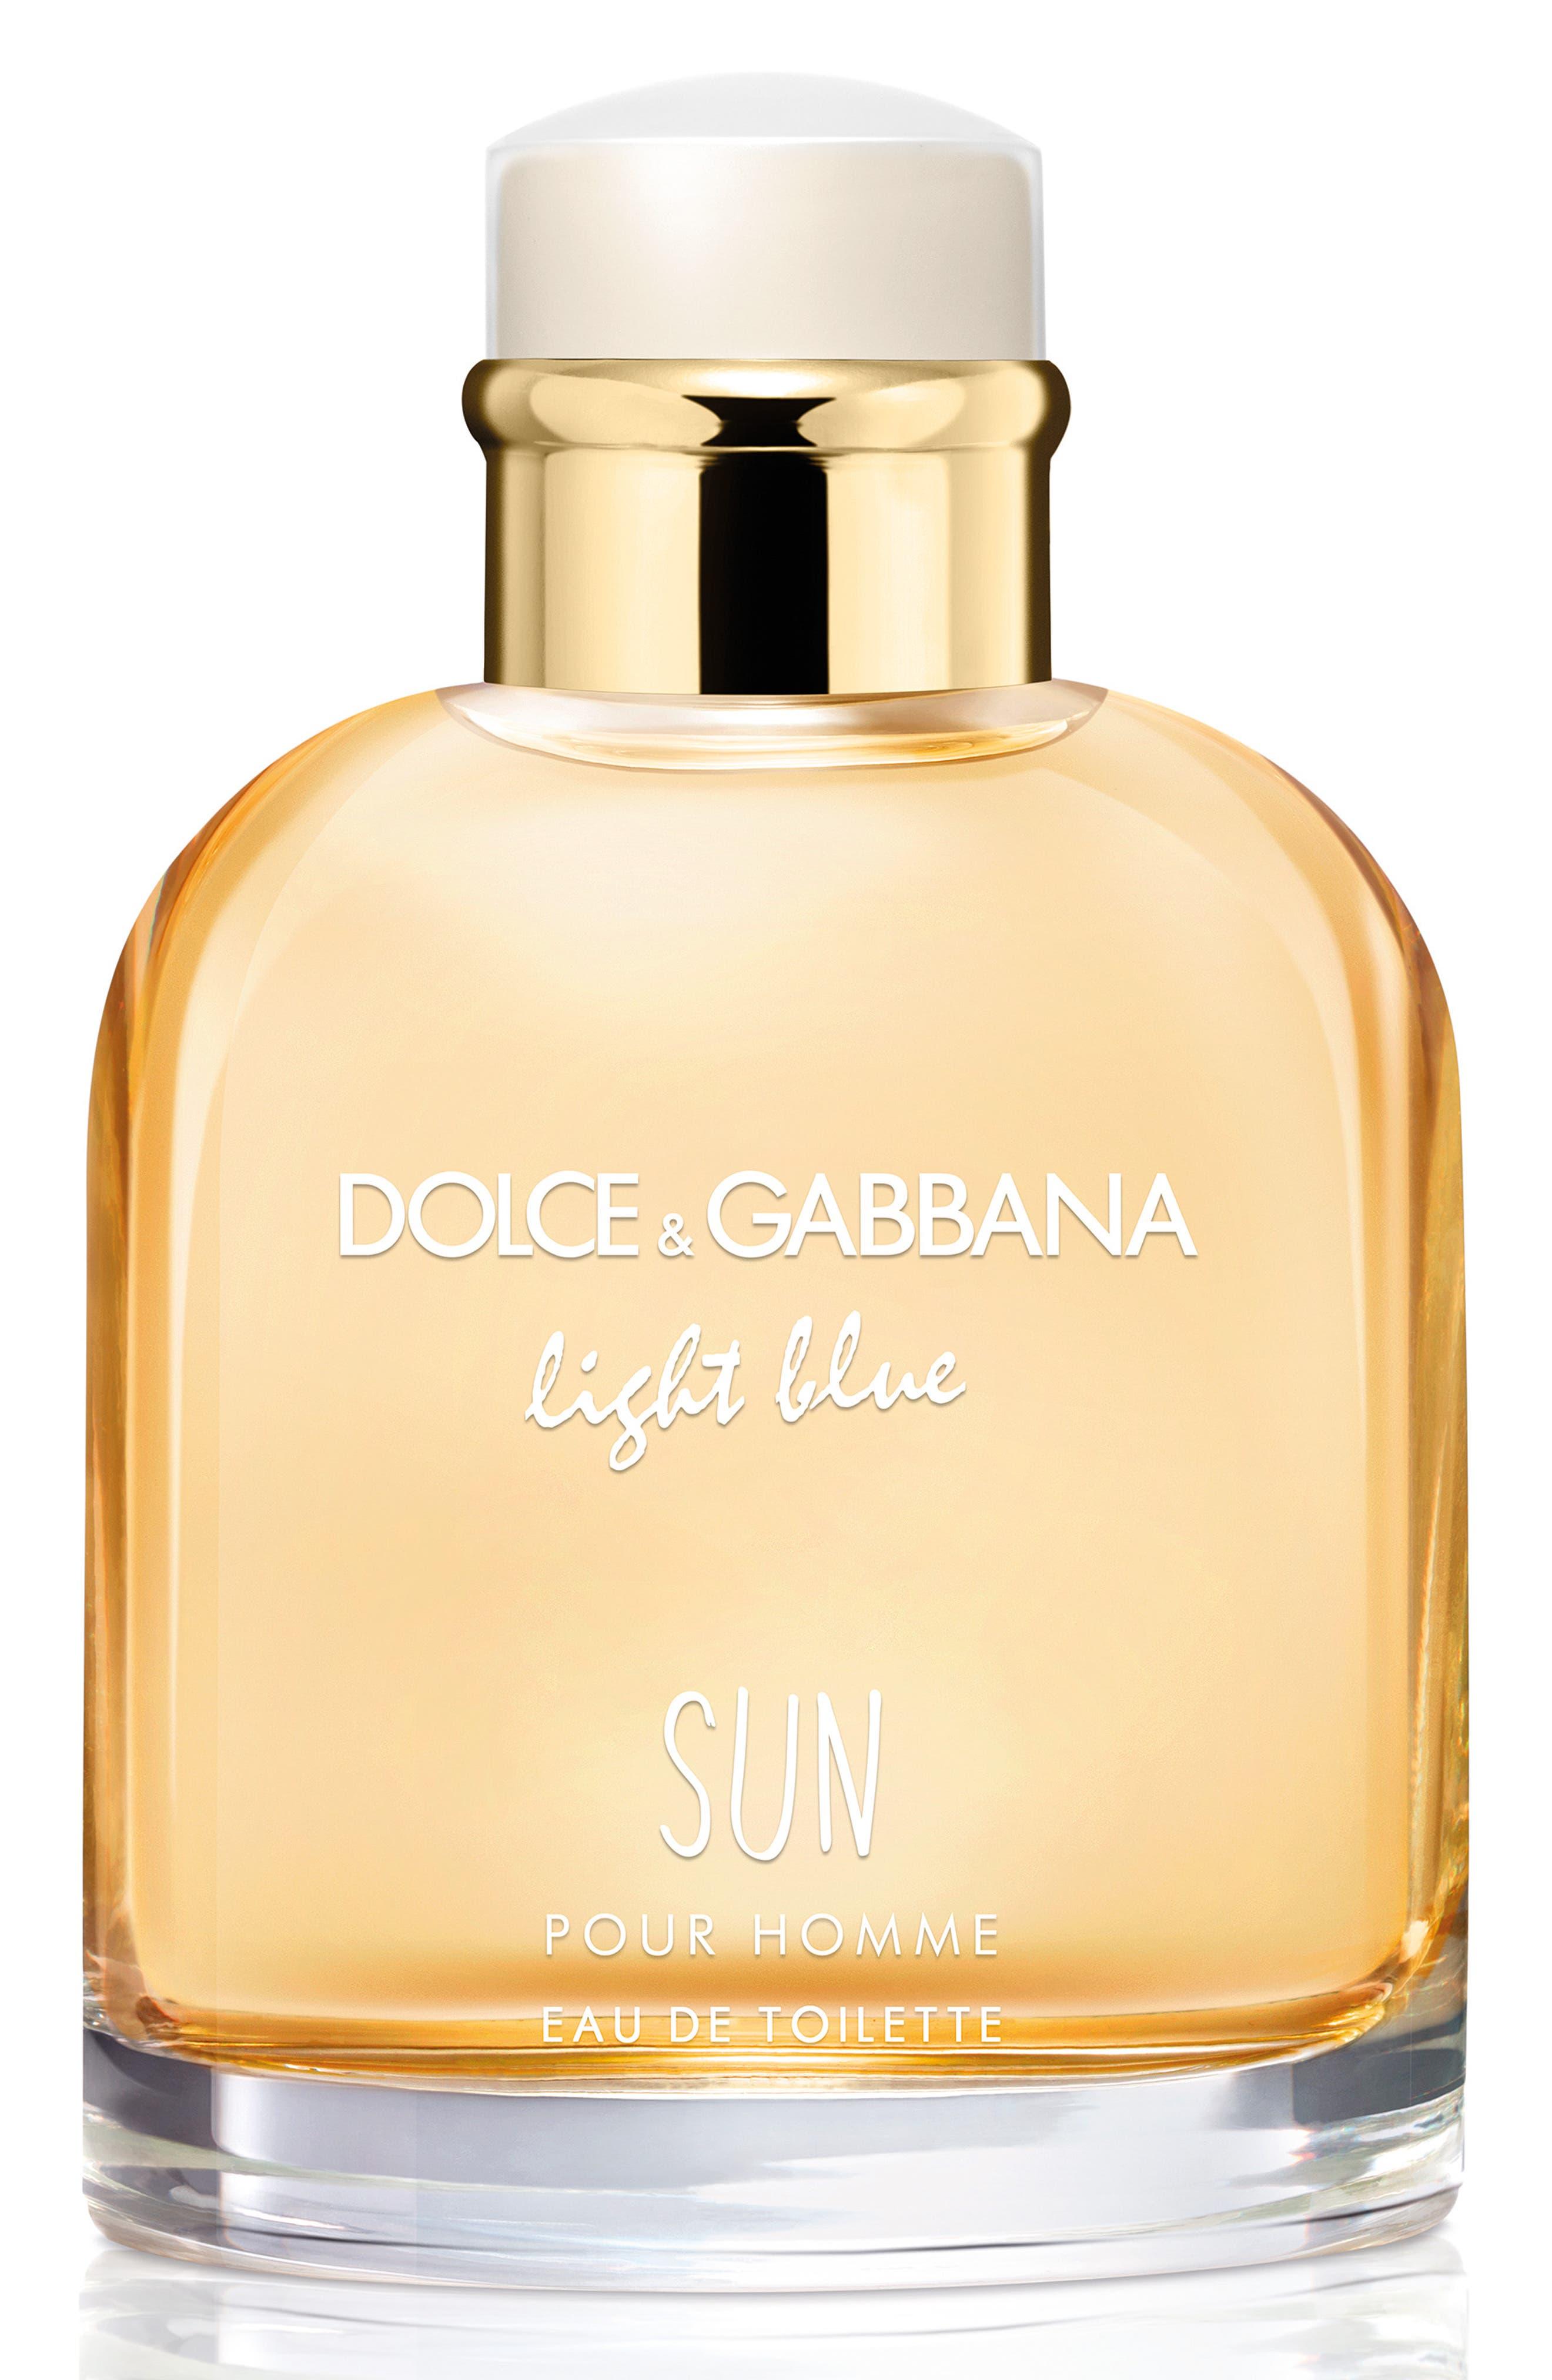 477caa2a275bc Dolce   Gabbana Men s Cologne   Fragrance